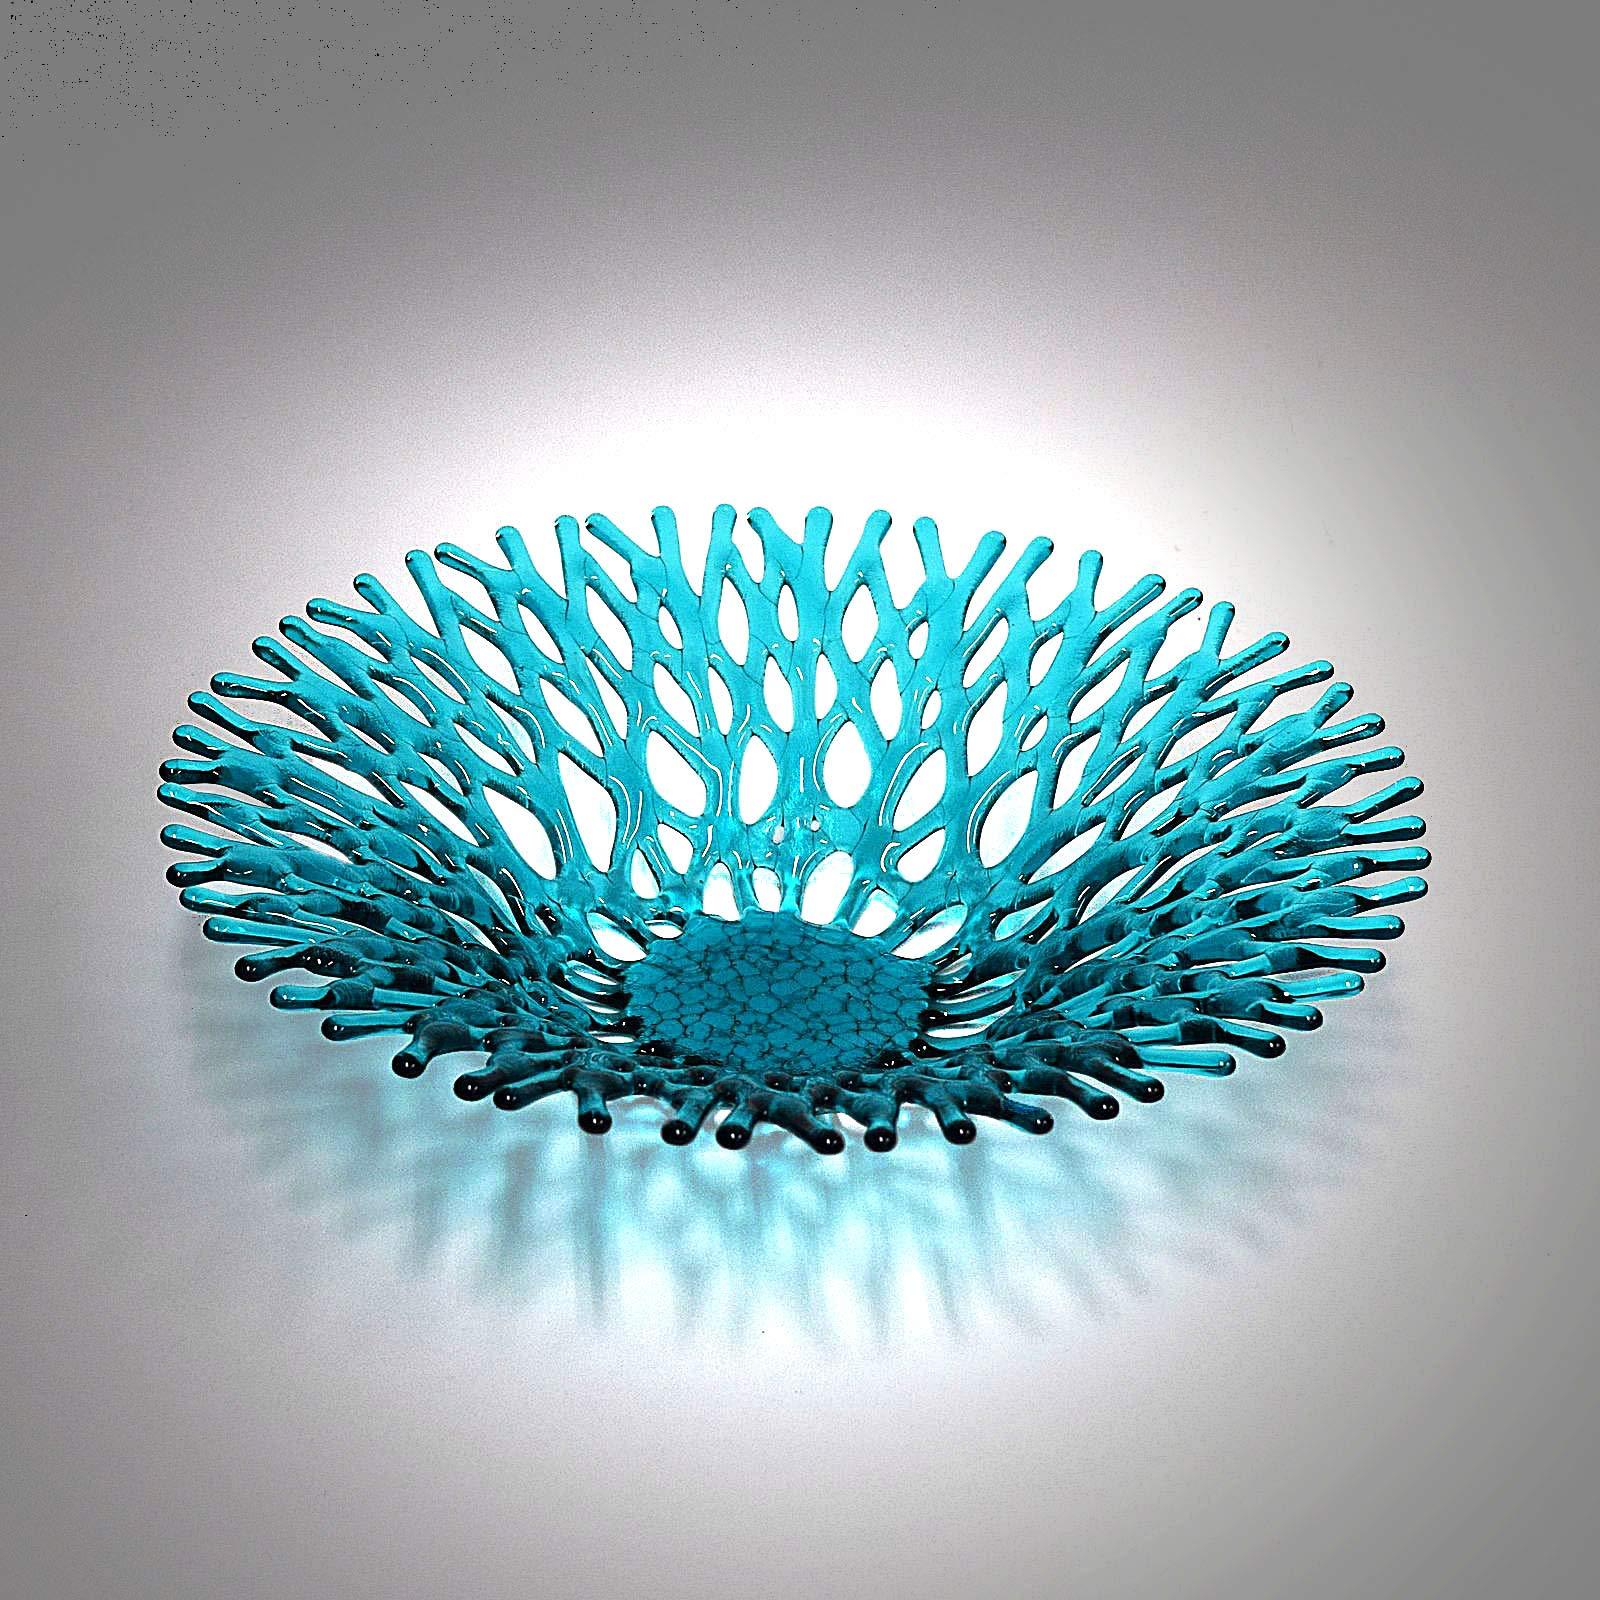 Fan Top Lacy Glass Art Sea Coral Fruit Bowl in Aqua Blue Green